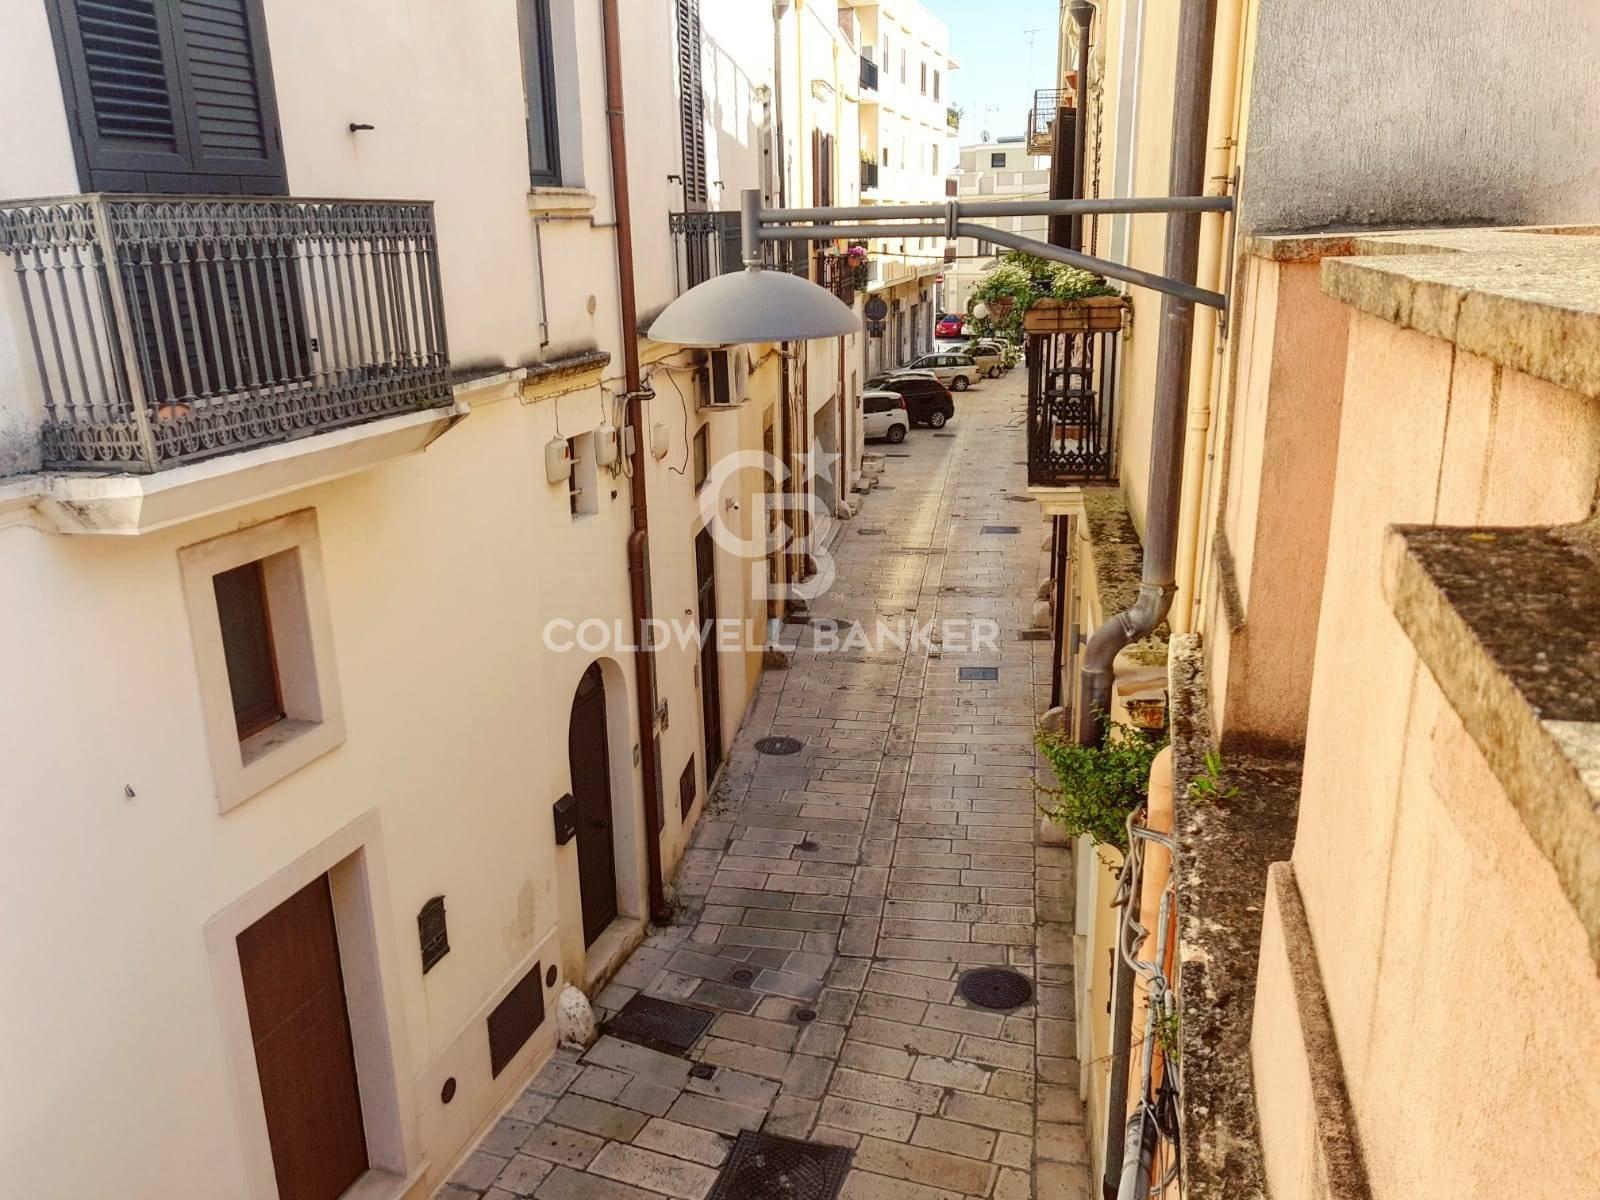 Casa indipendente in vendita a Brindisi (BR)